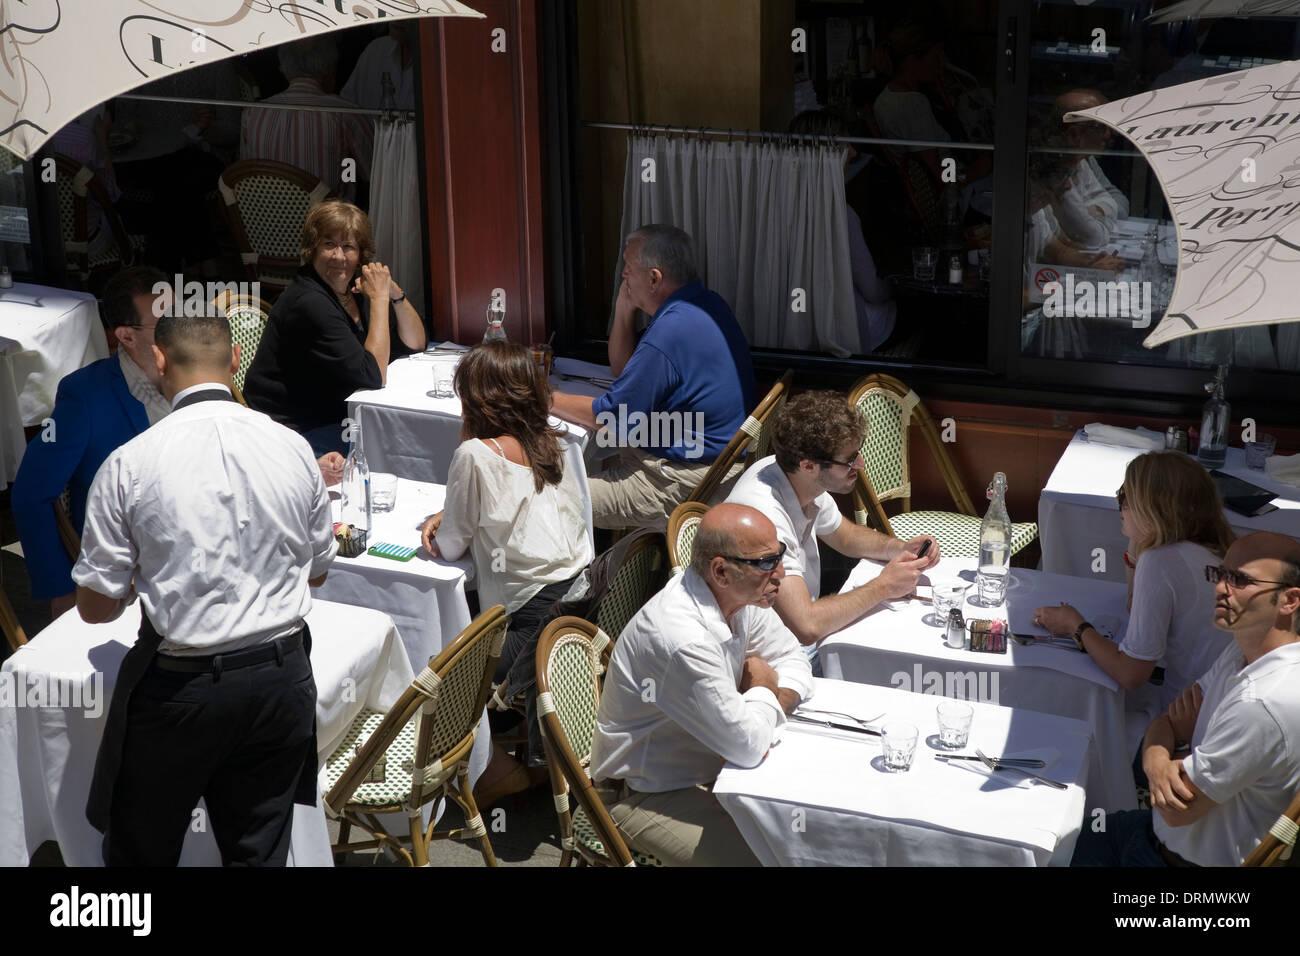 Diners on sidewalk restaurant San Francisco, CA, California, USA - Stock Image